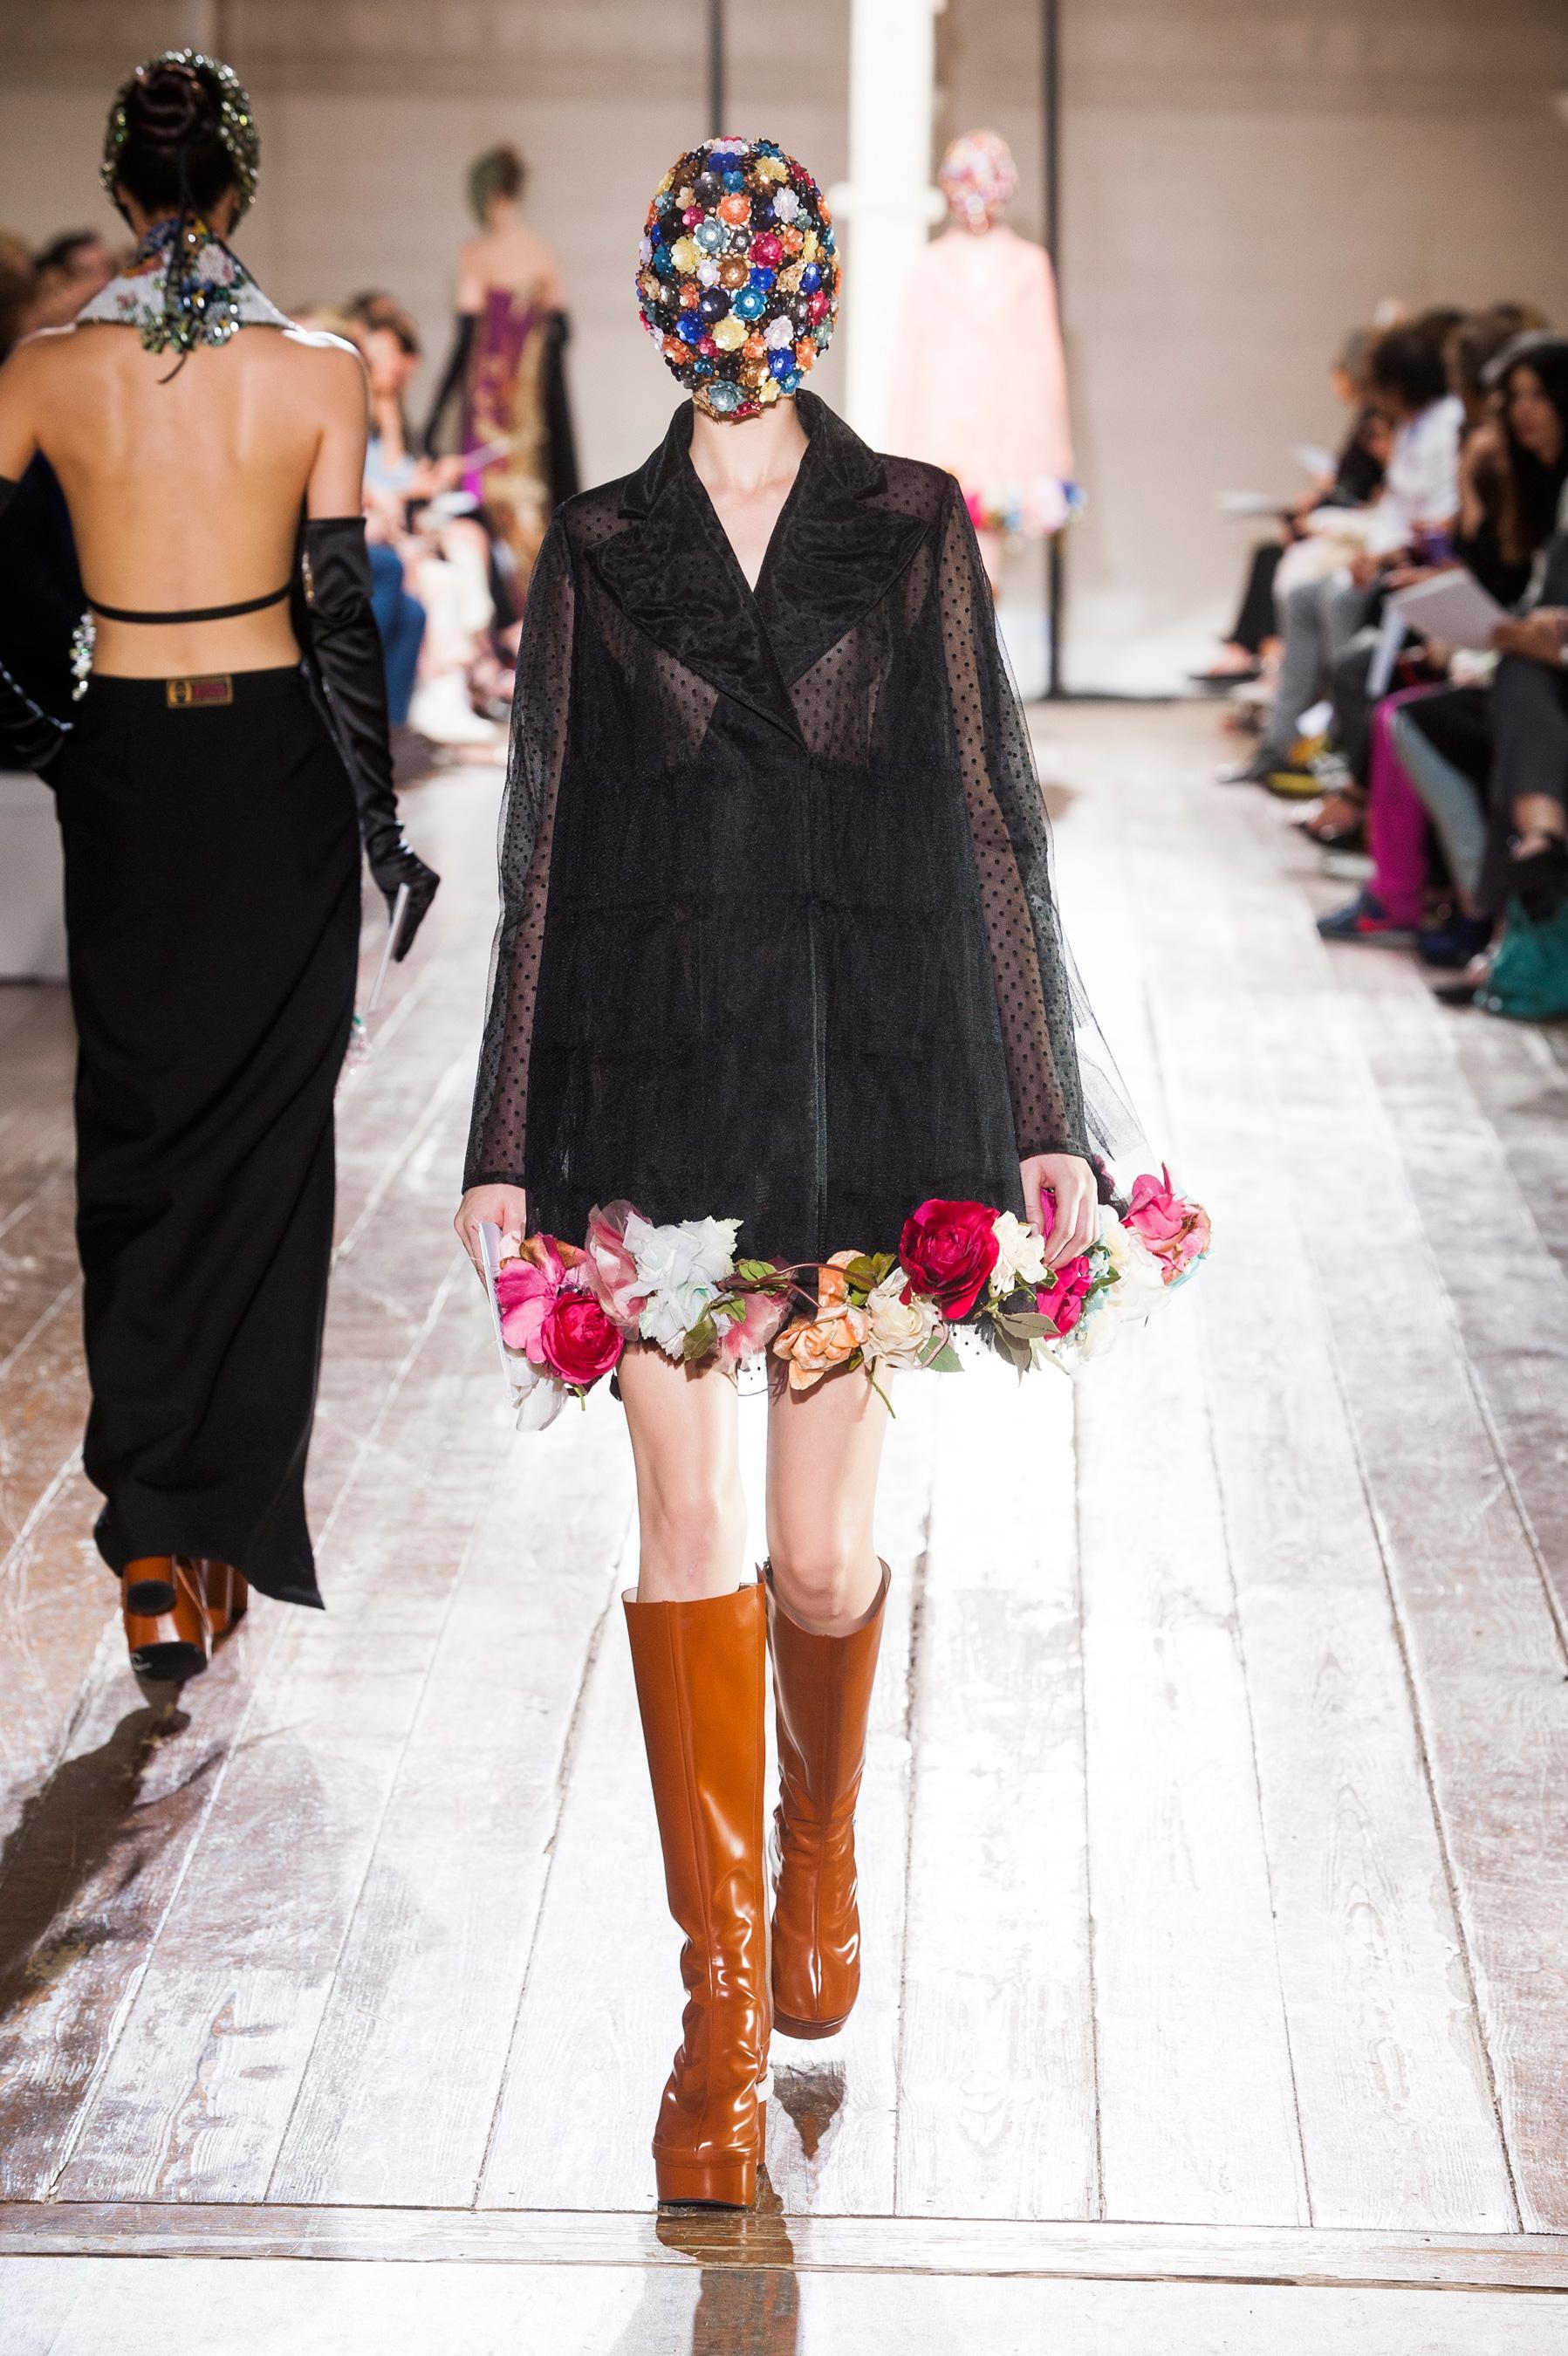 d fil maison margiela automne hiver 2013 2014 couture madame figaro. Black Bedroom Furniture Sets. Home Design Ideas